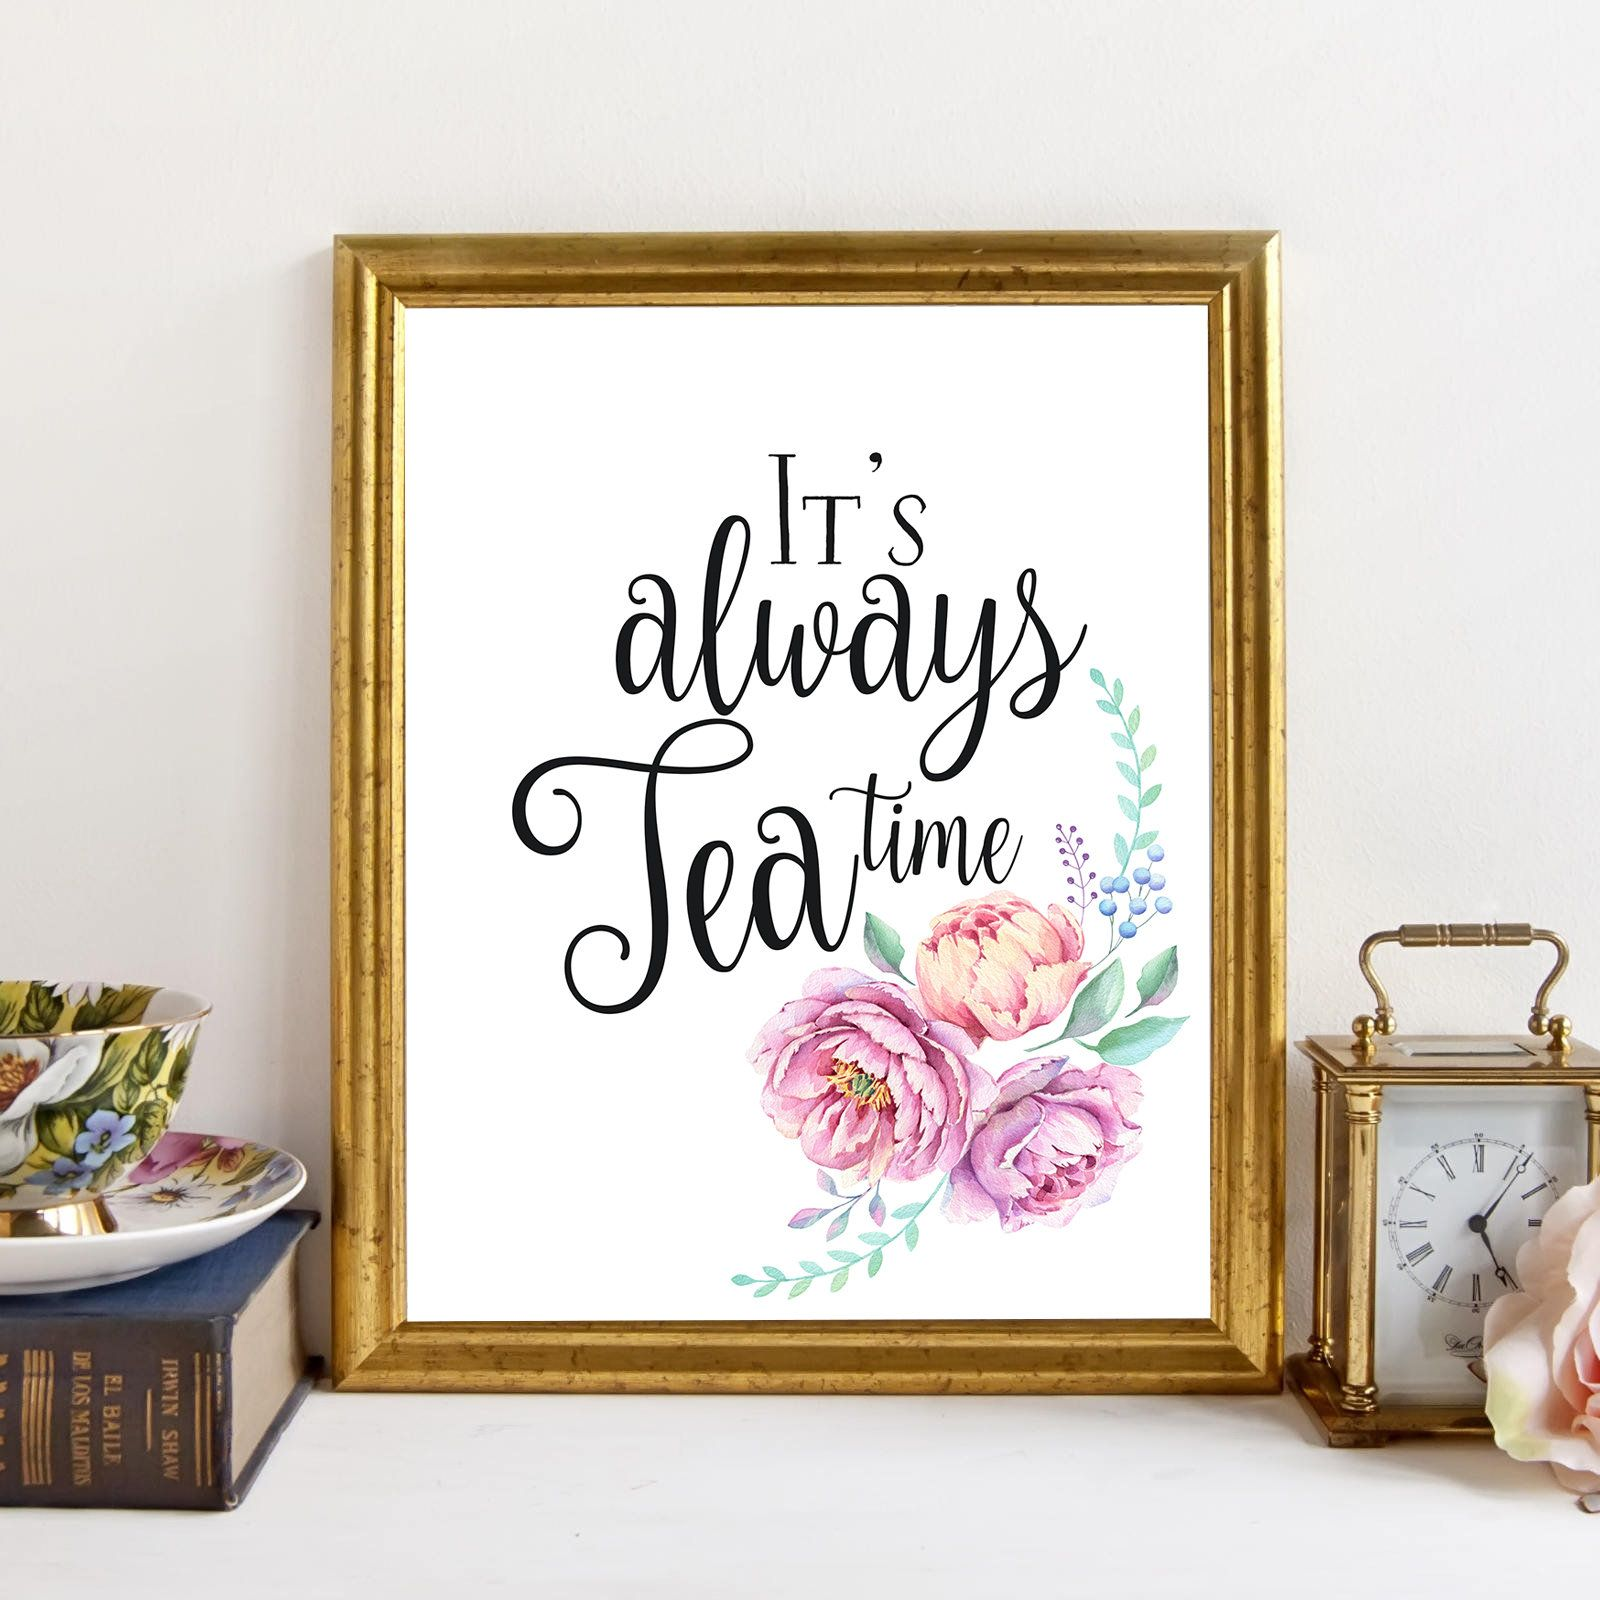 Its always tea timeteapot floral art printkitchen decorkitchen